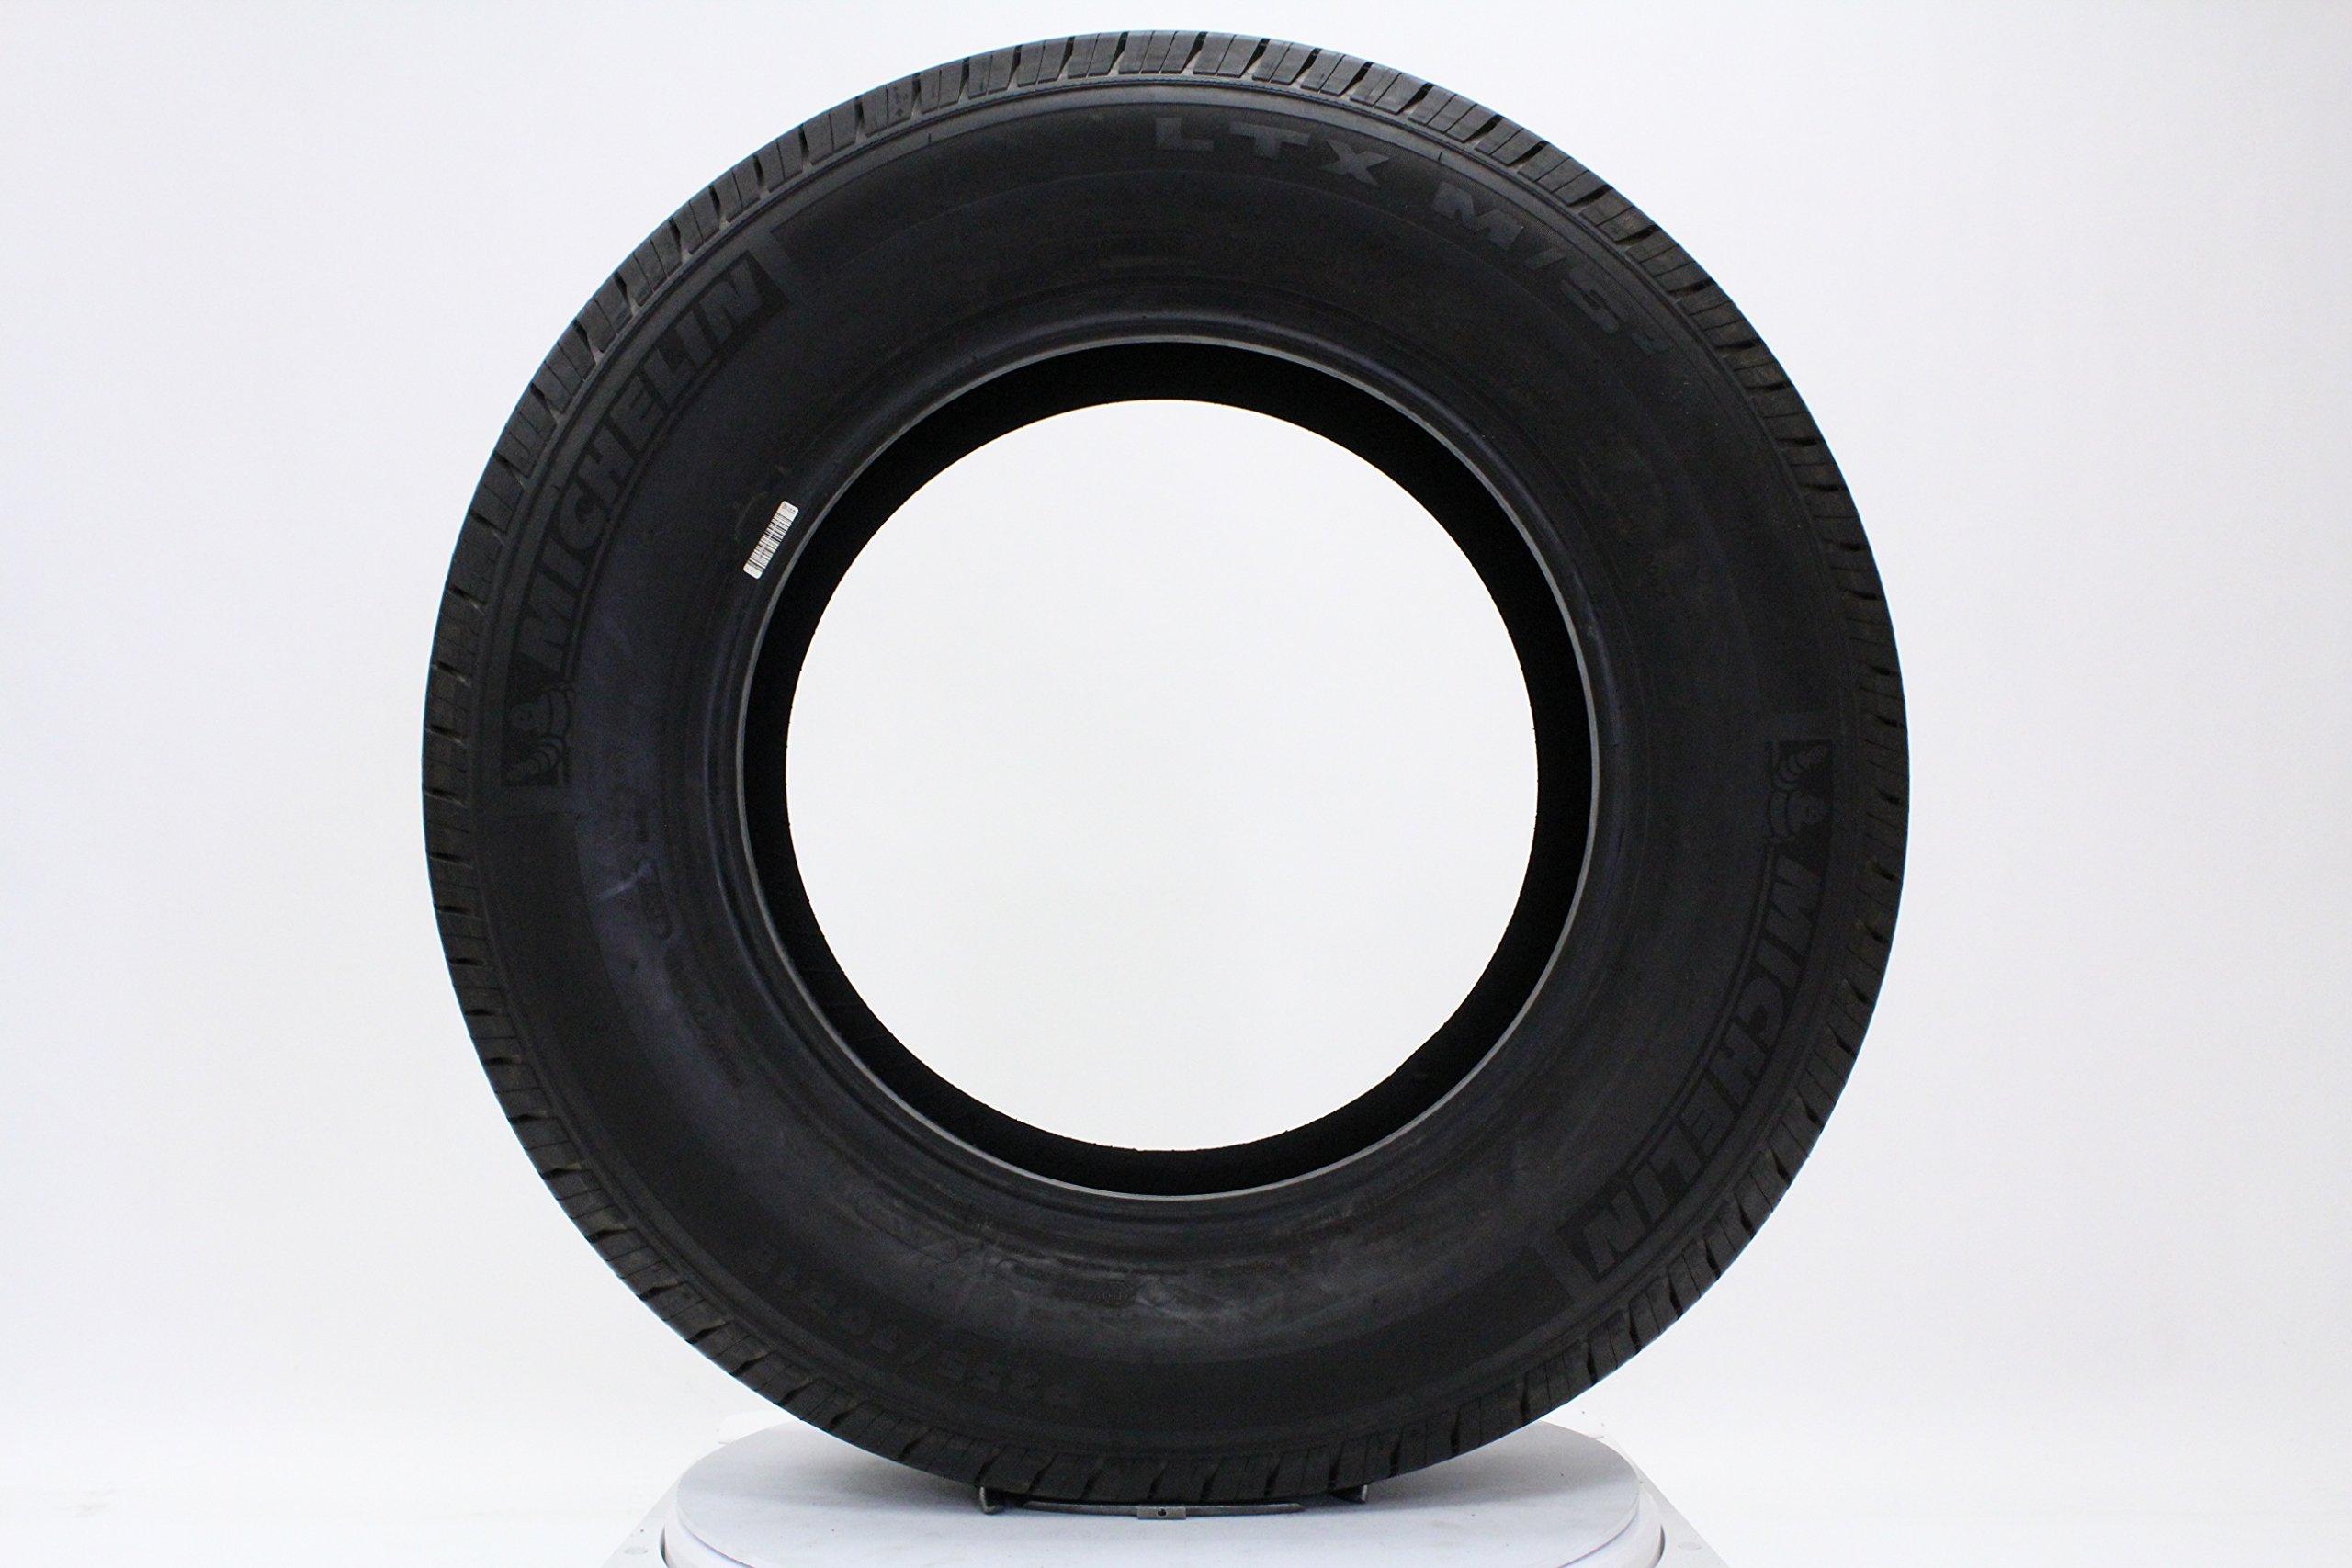 MICHELIN LTX M/S2 All Season Radial Tire-245/75R17 112S